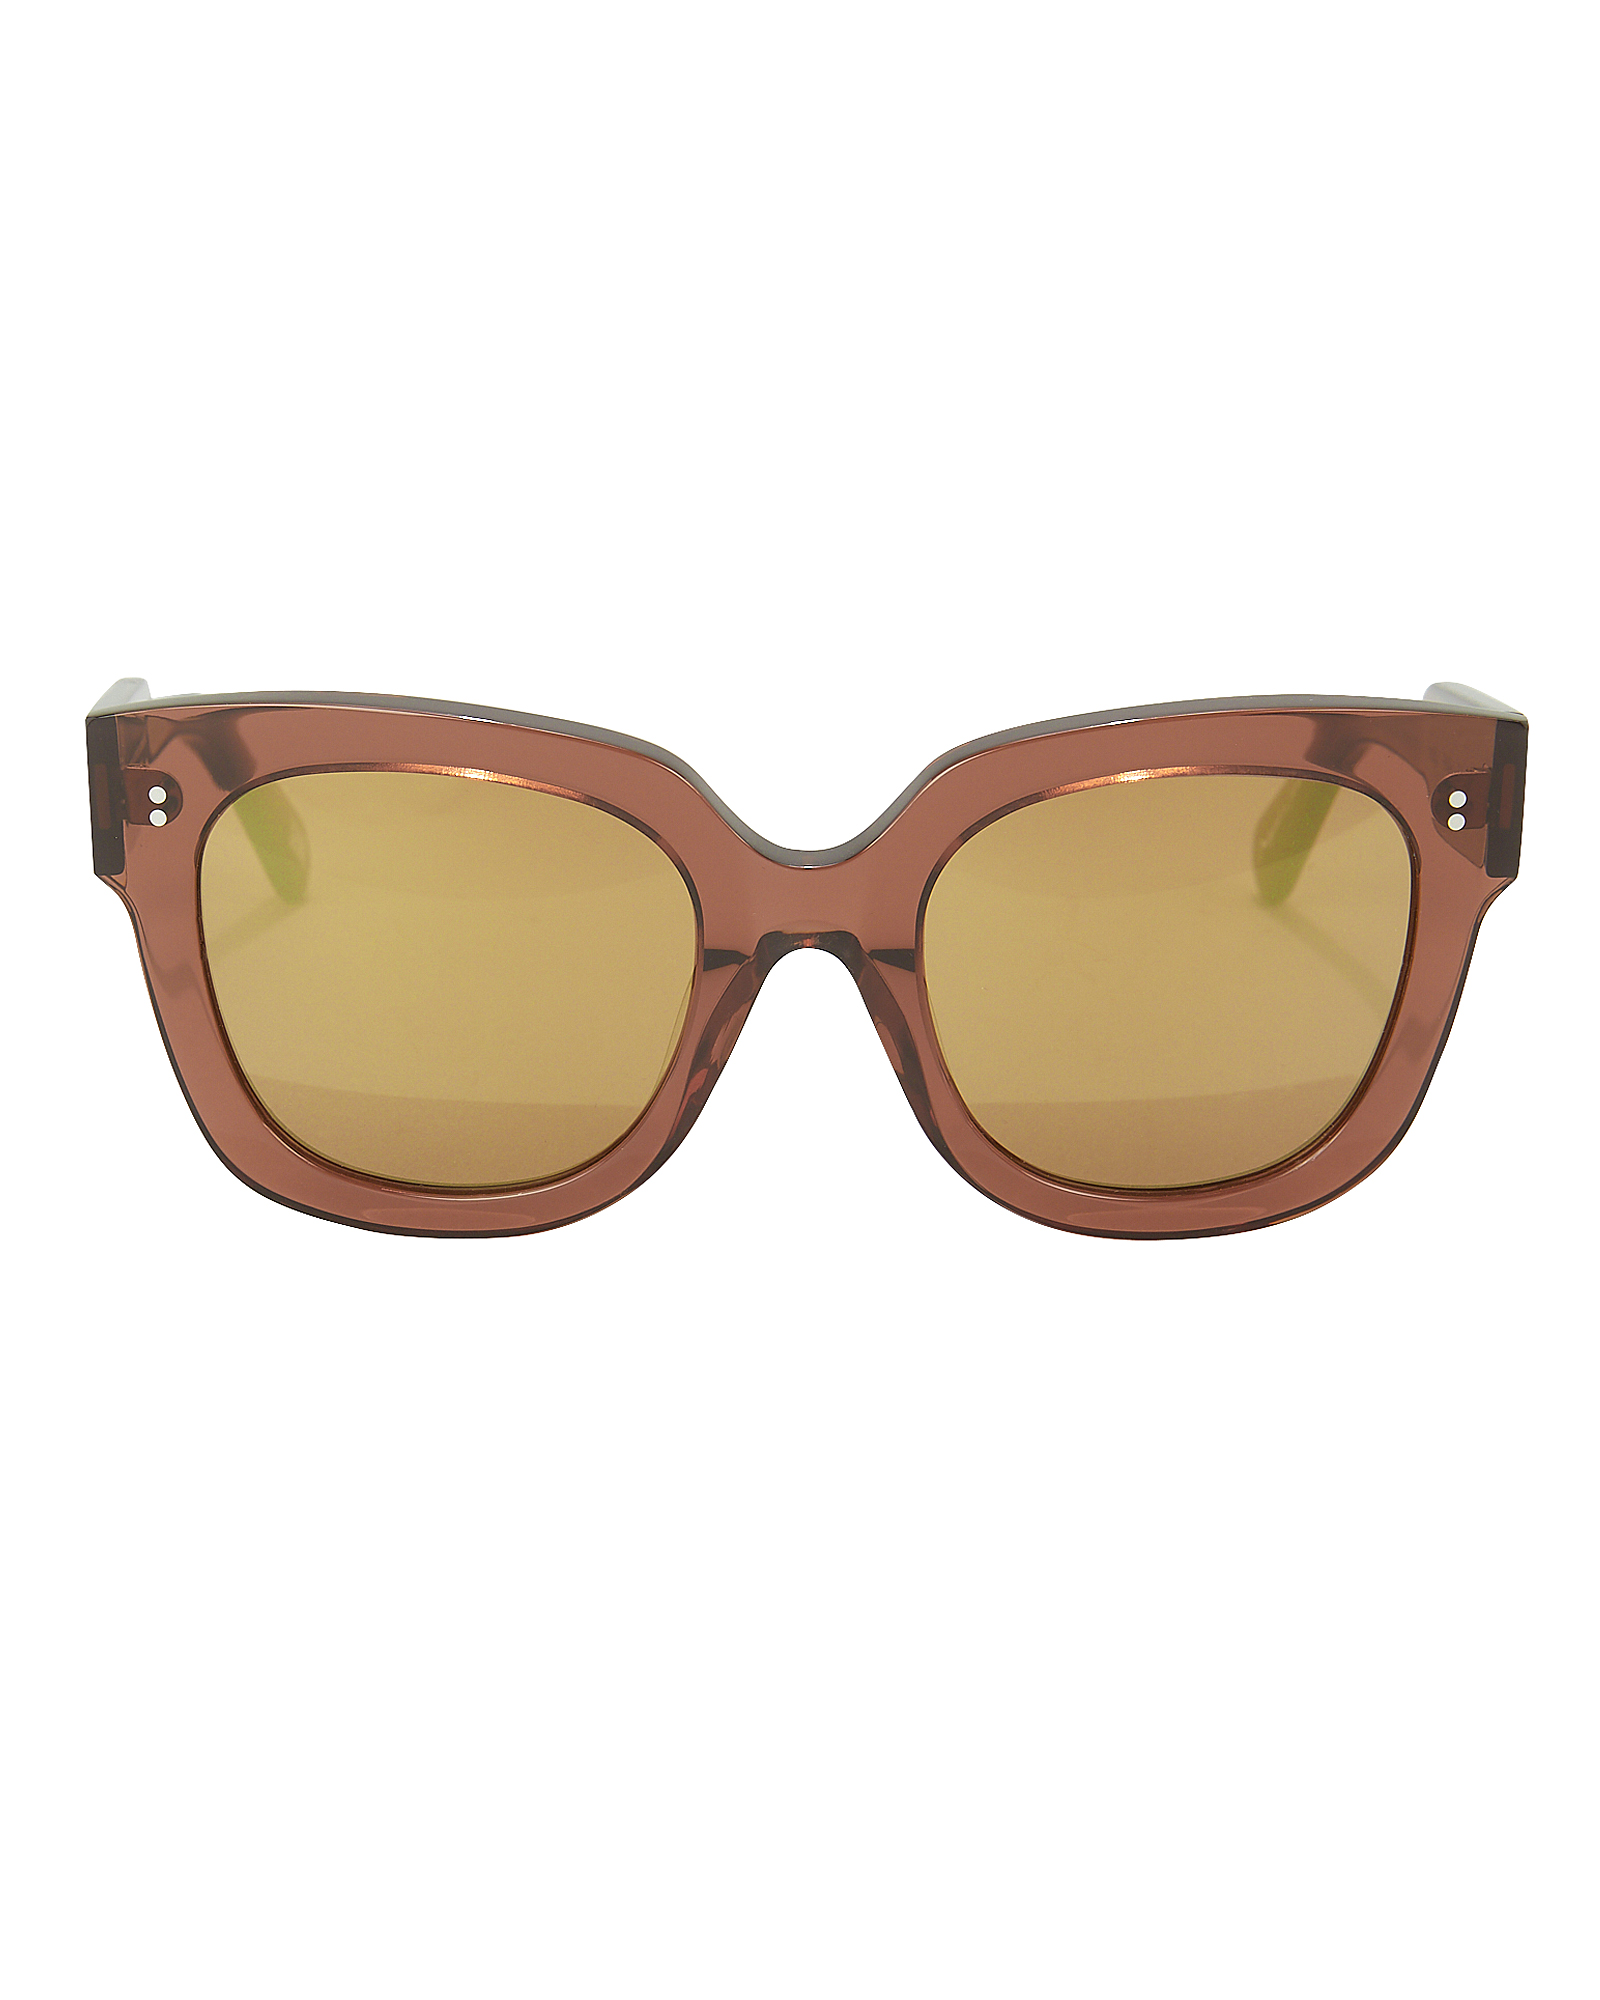 CHIMI EYEWEAR 008 Coco Sunglasses